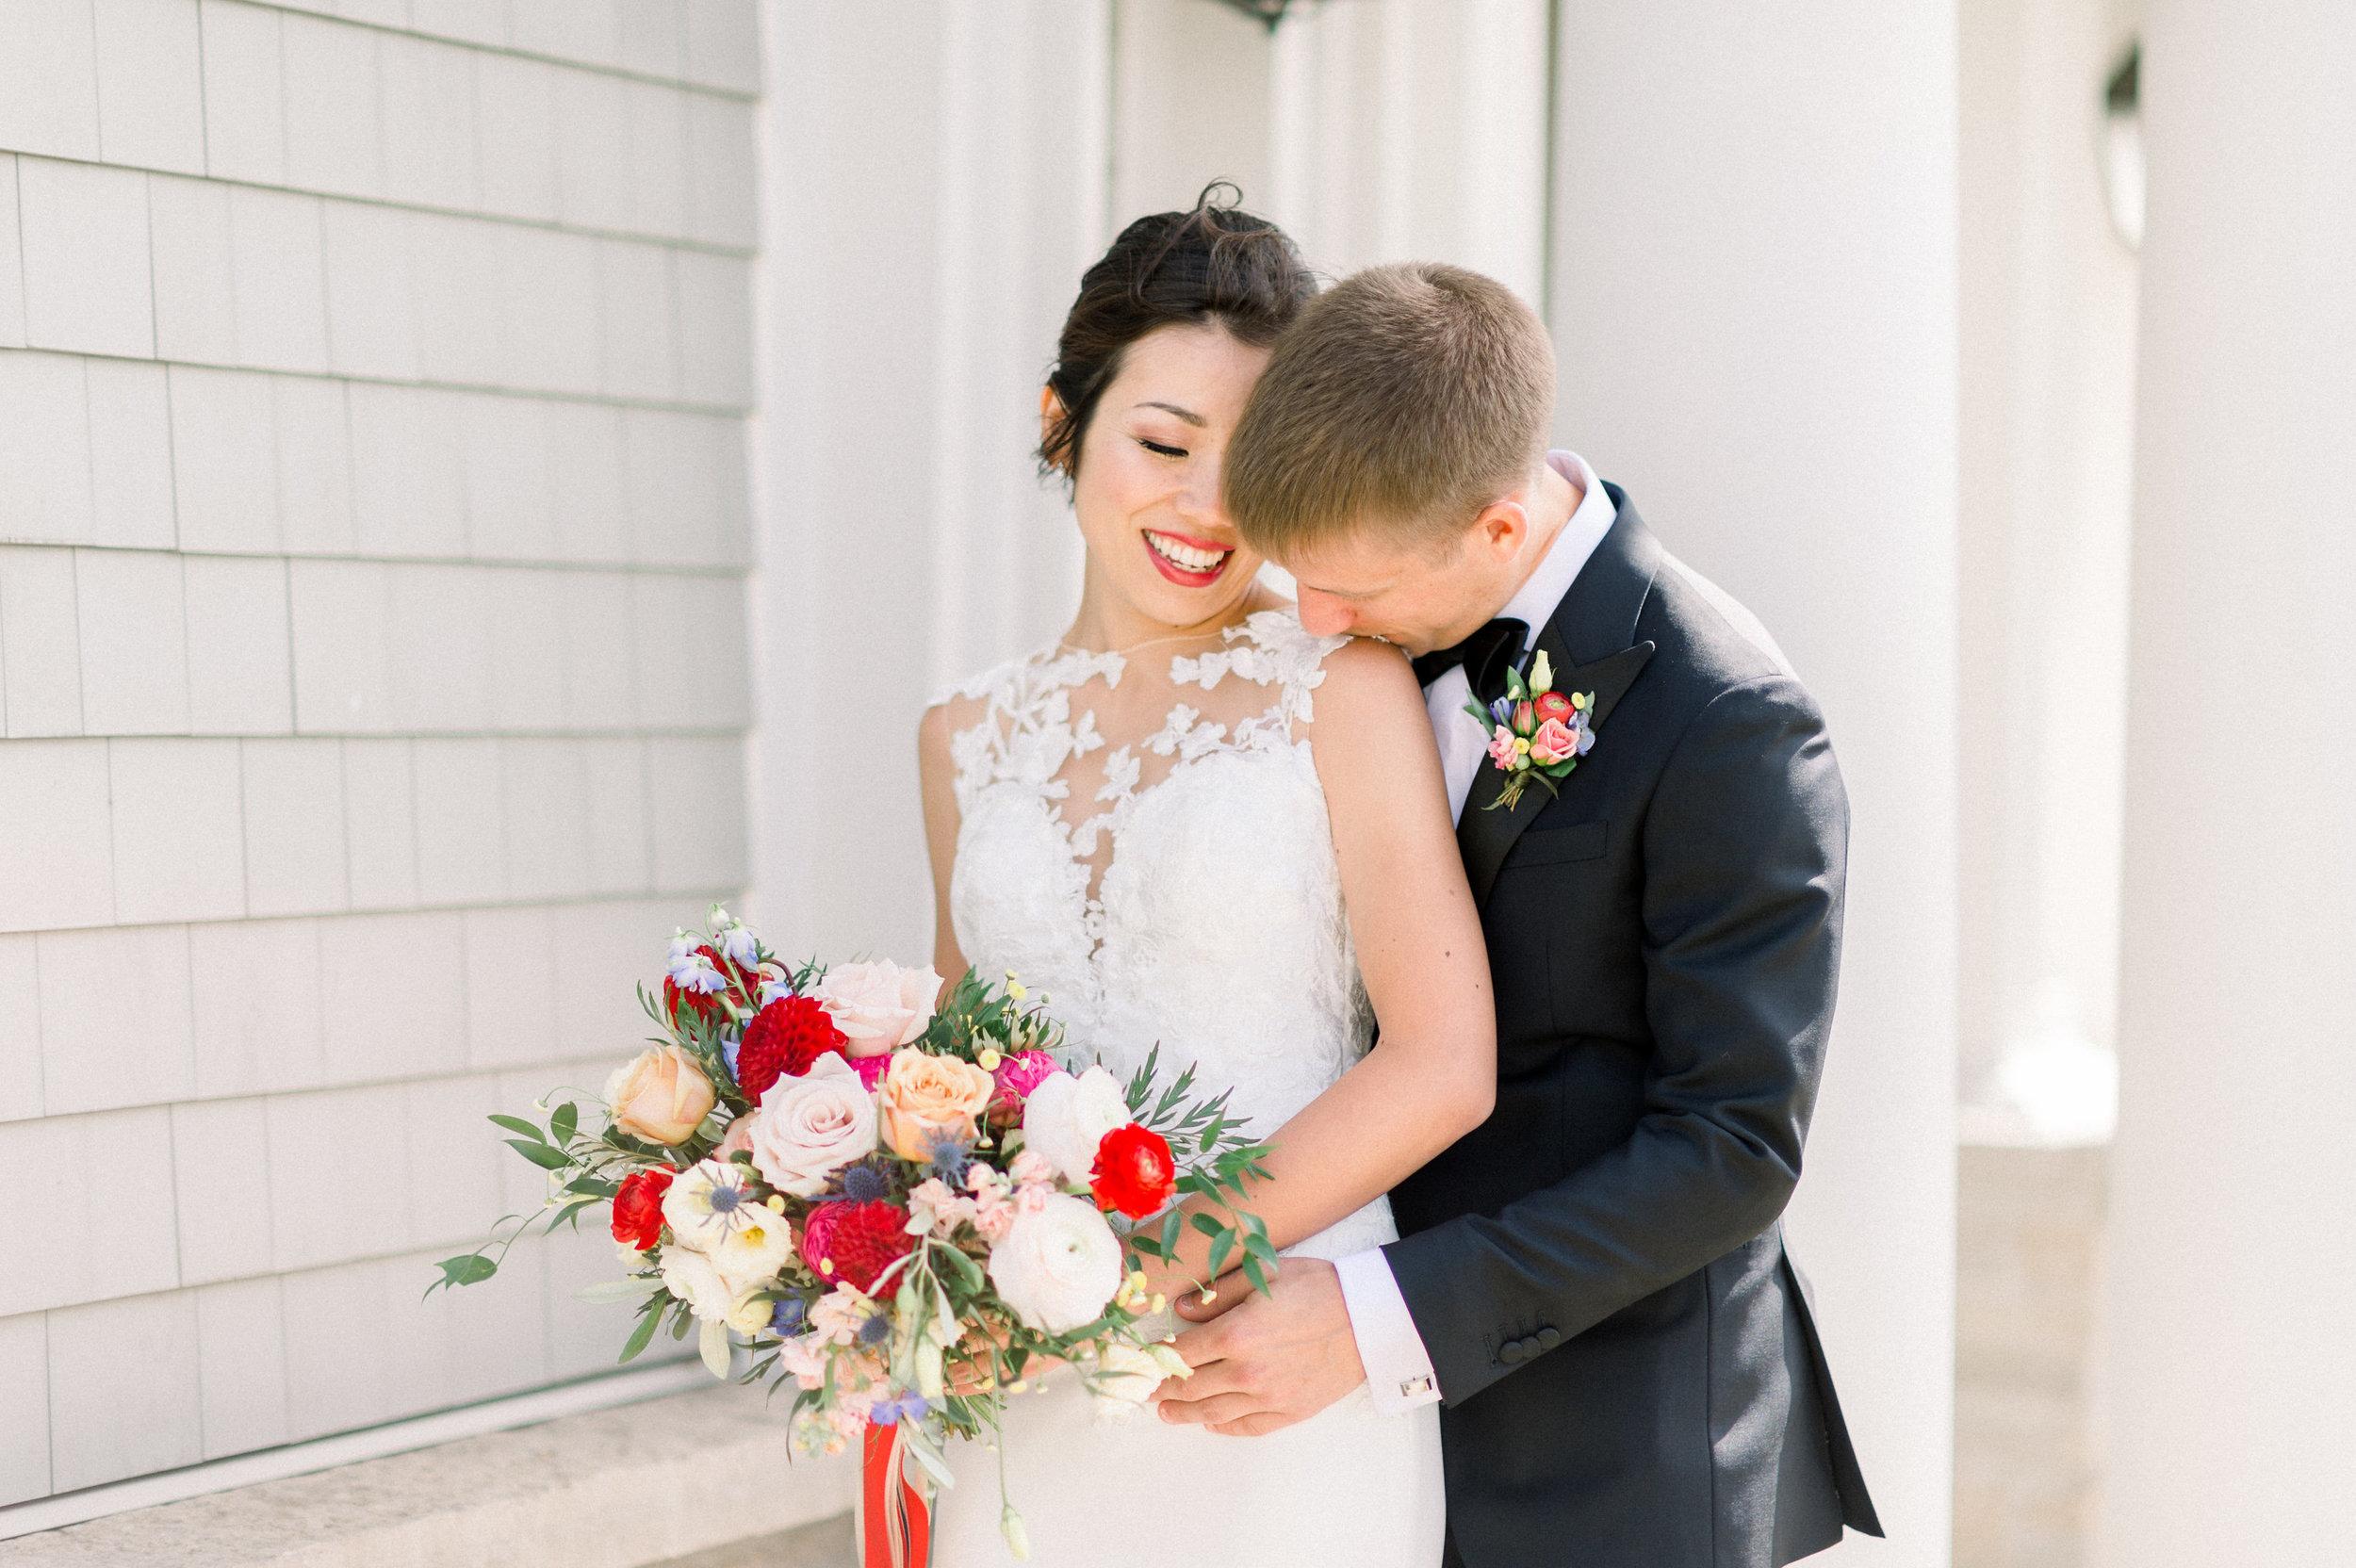 Mamiko-Aaron-Wedding-Whitney-Heard-Photography-6032.jpg